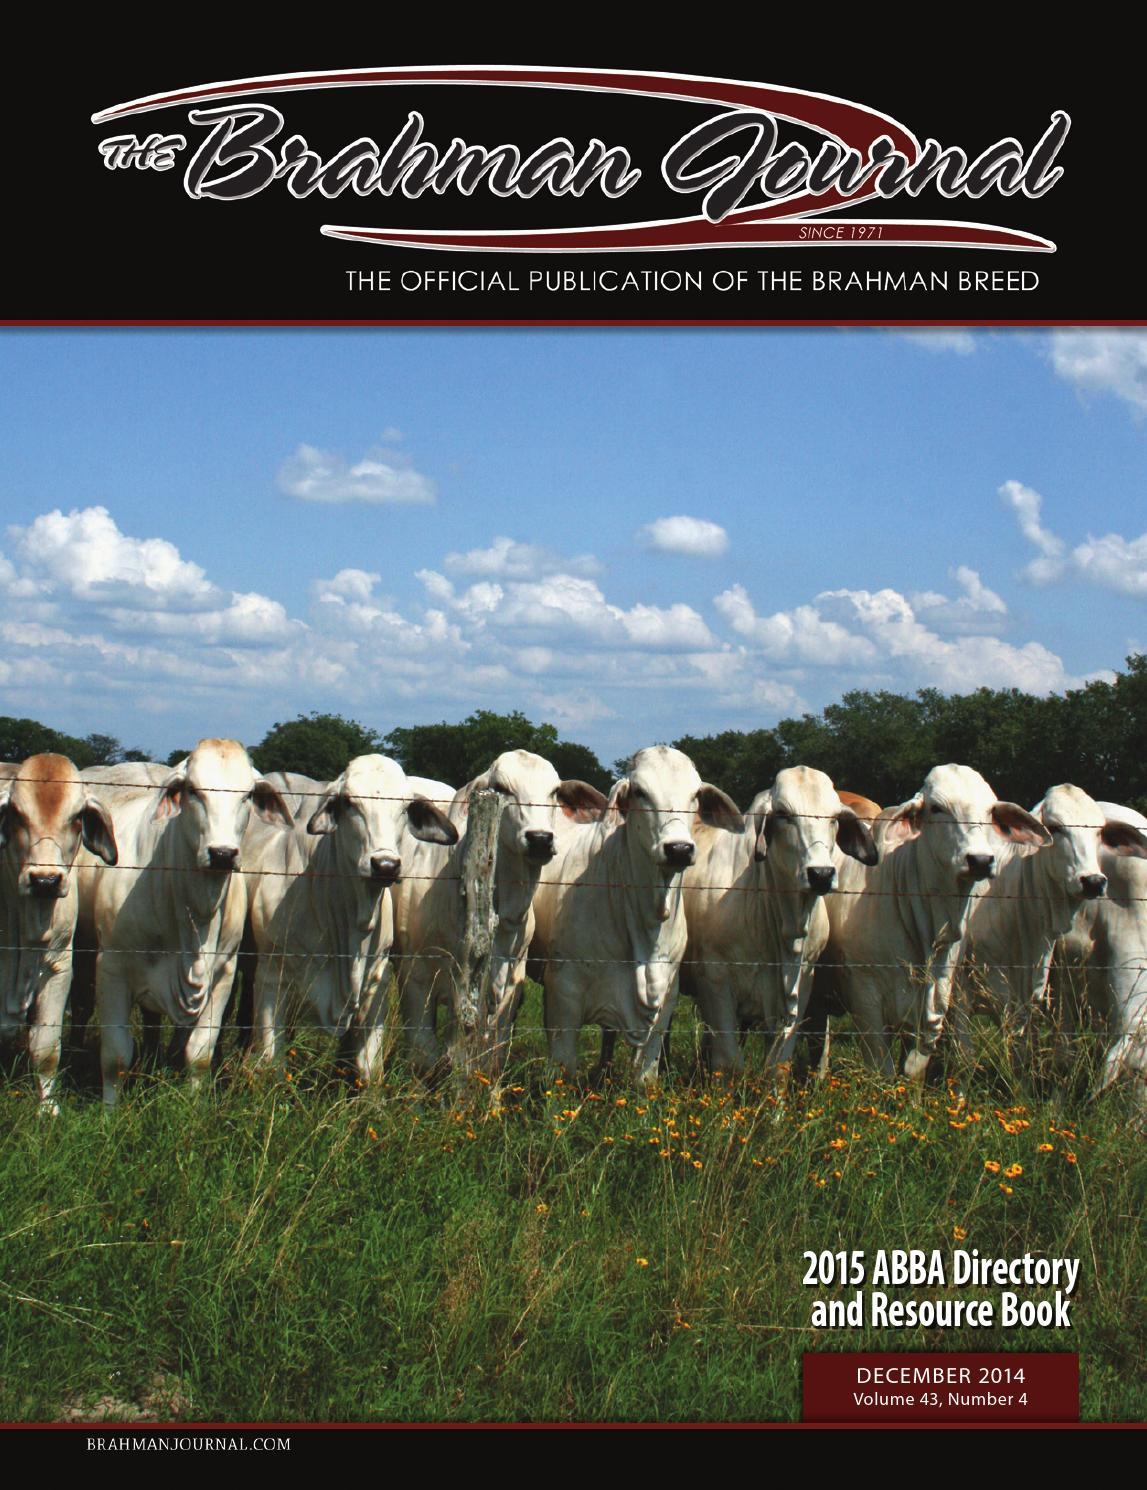 The Brahman Journal December 2014 by Caballo Rojo Publishing - The Brahman  Journal - issuu